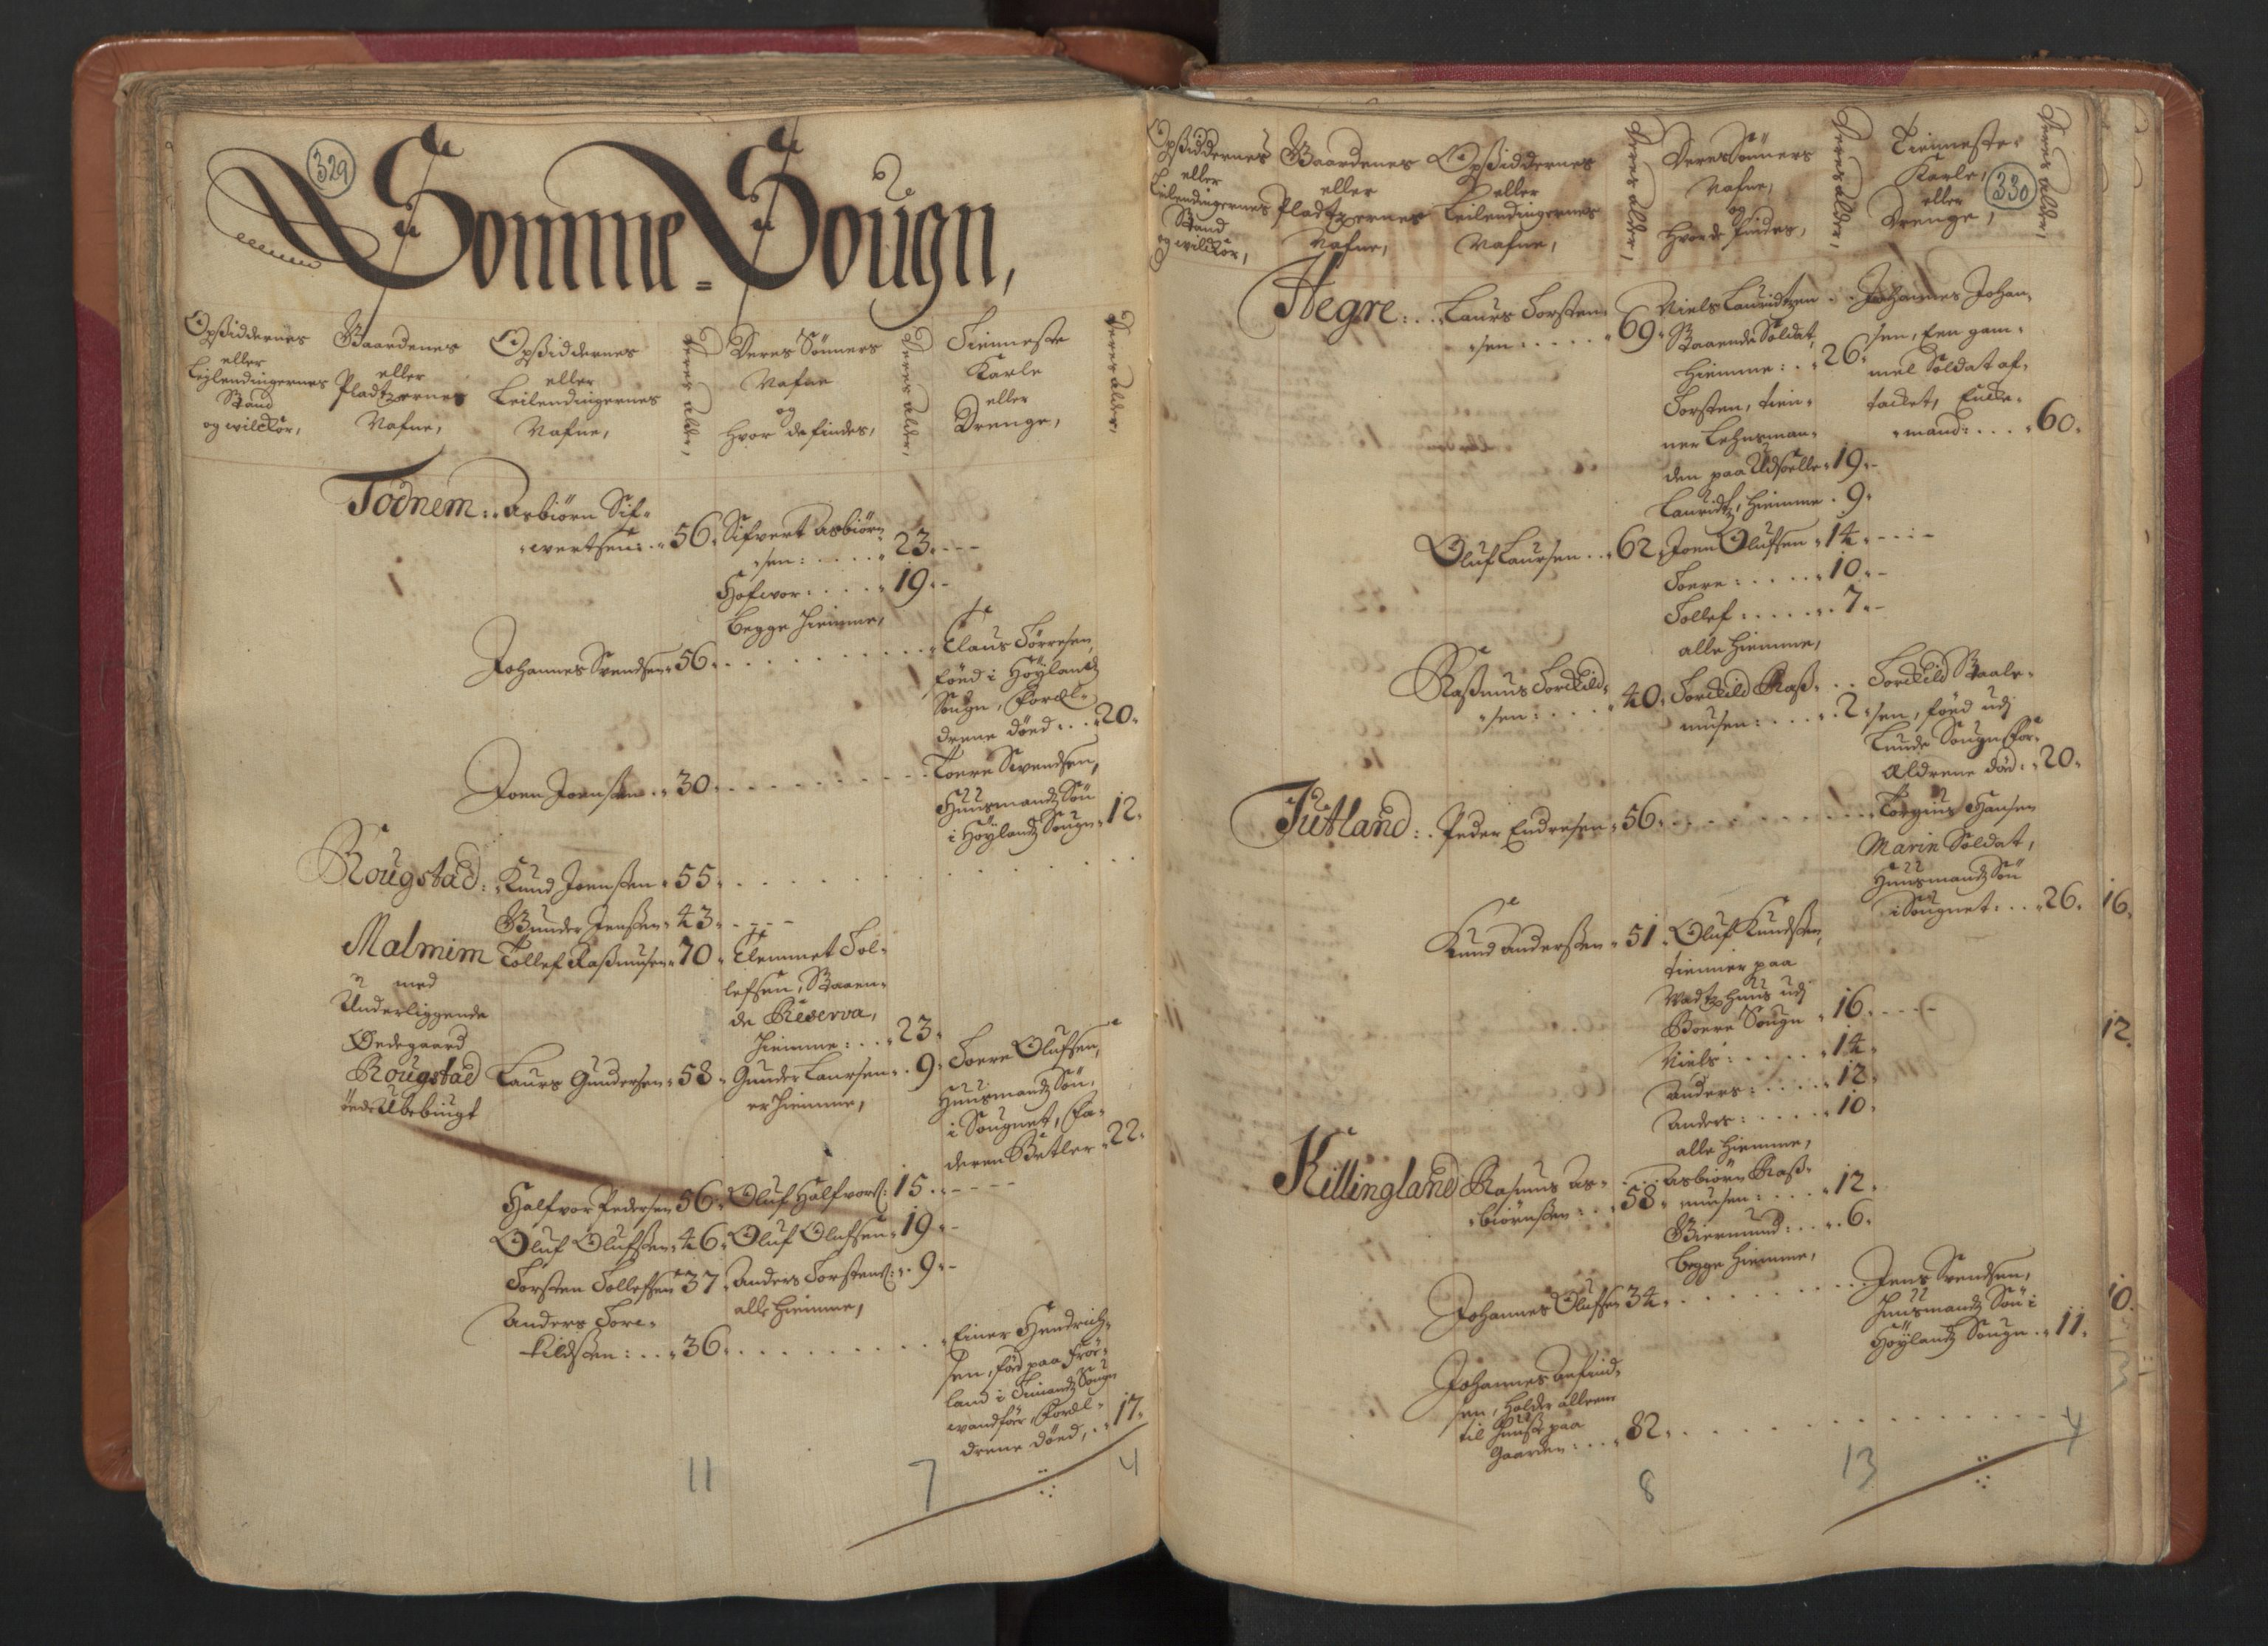 RA, Manntallet 1701, nr. 4: Jæren og Dalane fogderi, 1701, s. 329-330